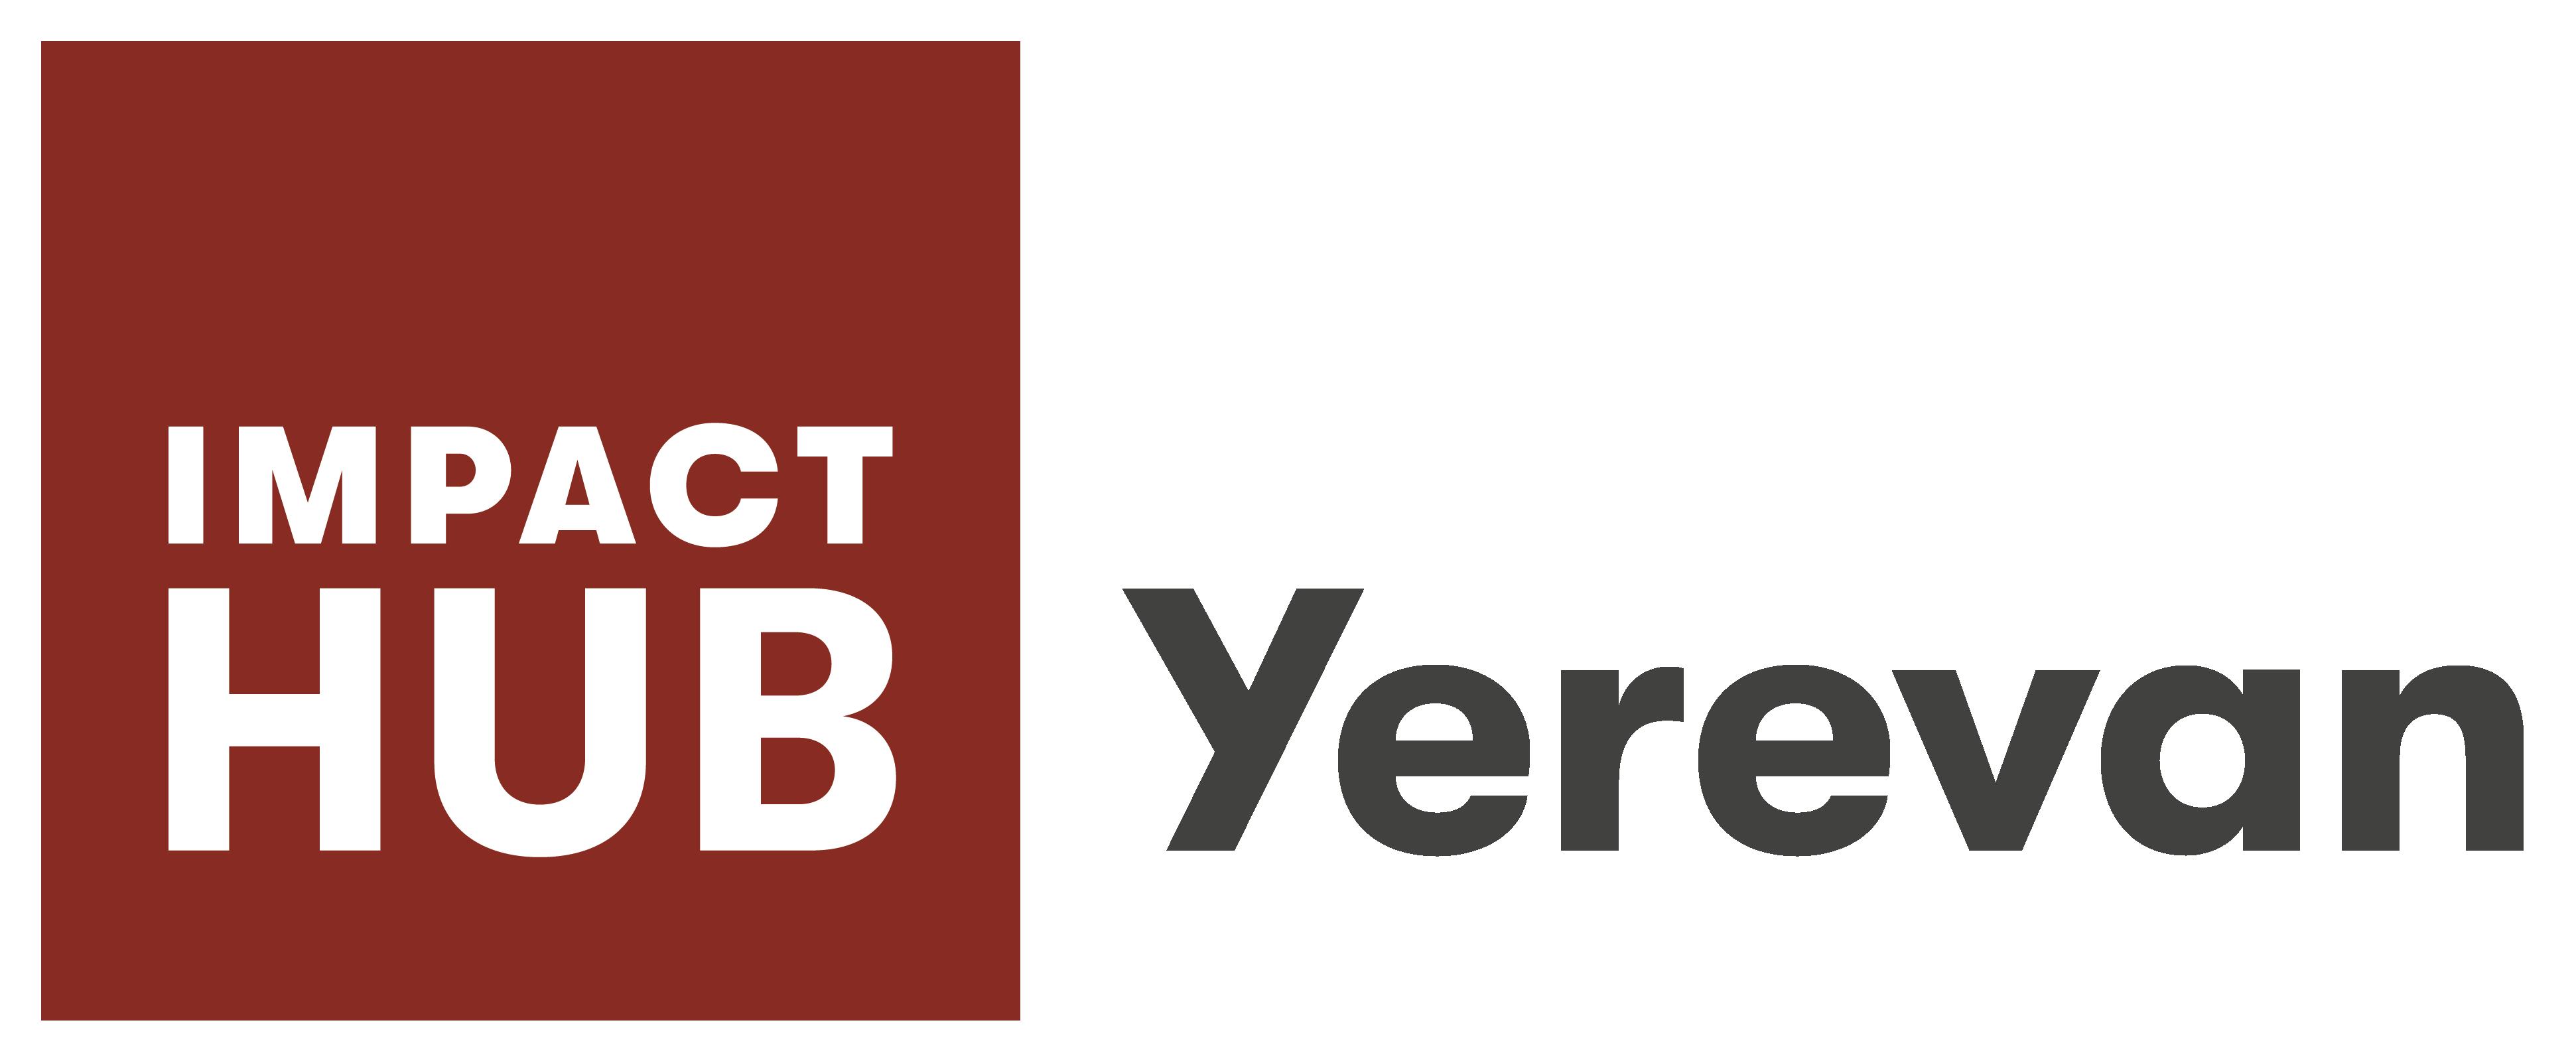 Impact Hub Yerevan logo